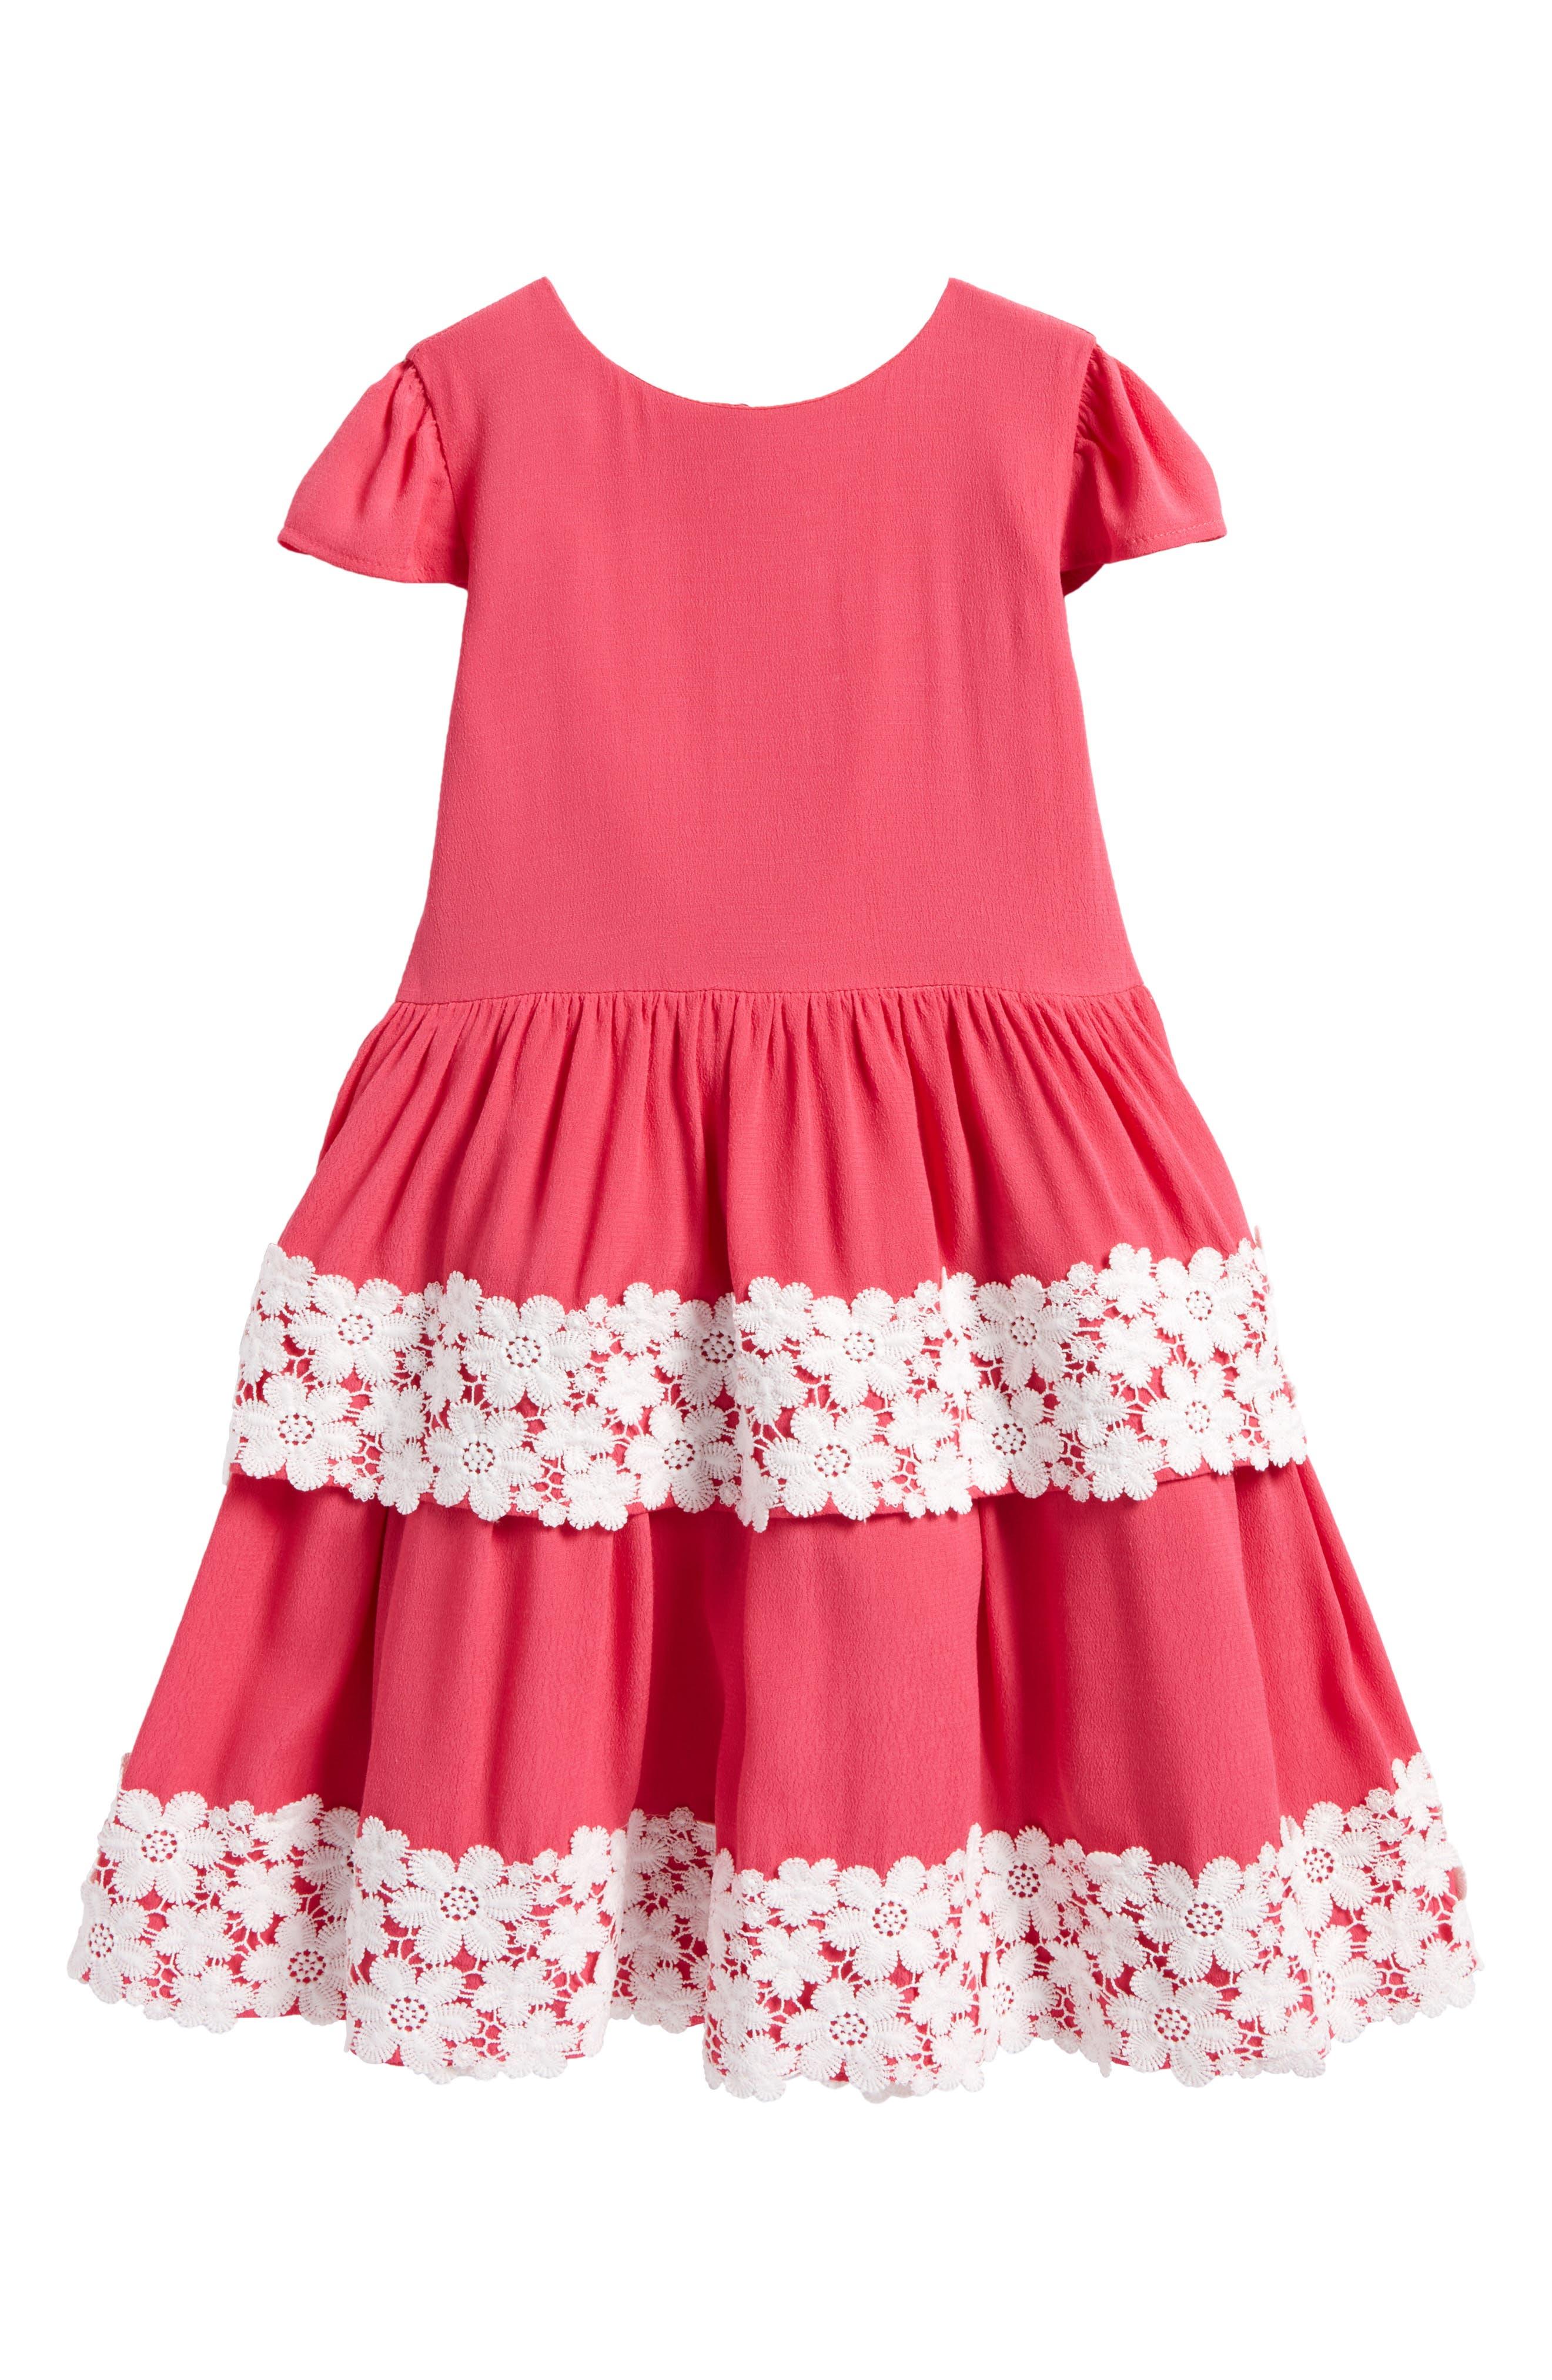 Tiered Skirt Dress,                             Main thumbnail 1, color,                             953